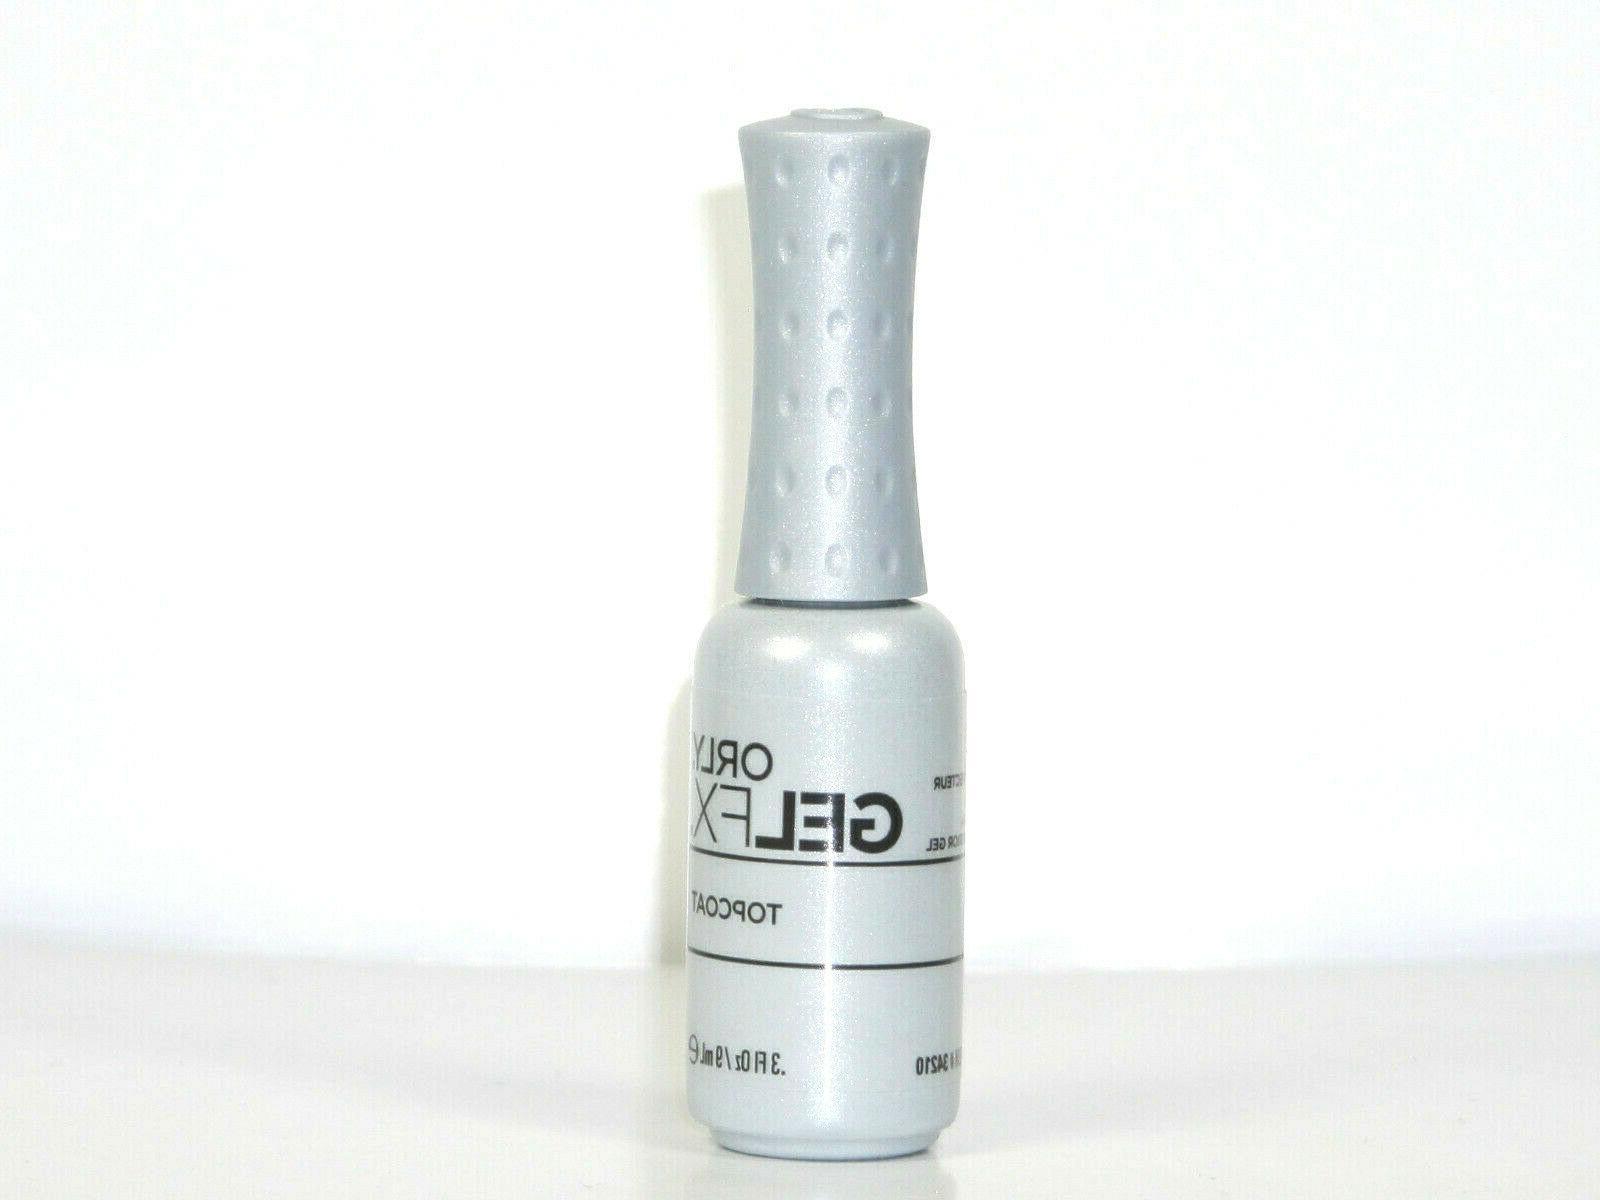 Orly Gel 34110 34210 Top Coat UV Nail Soak Off .3oz